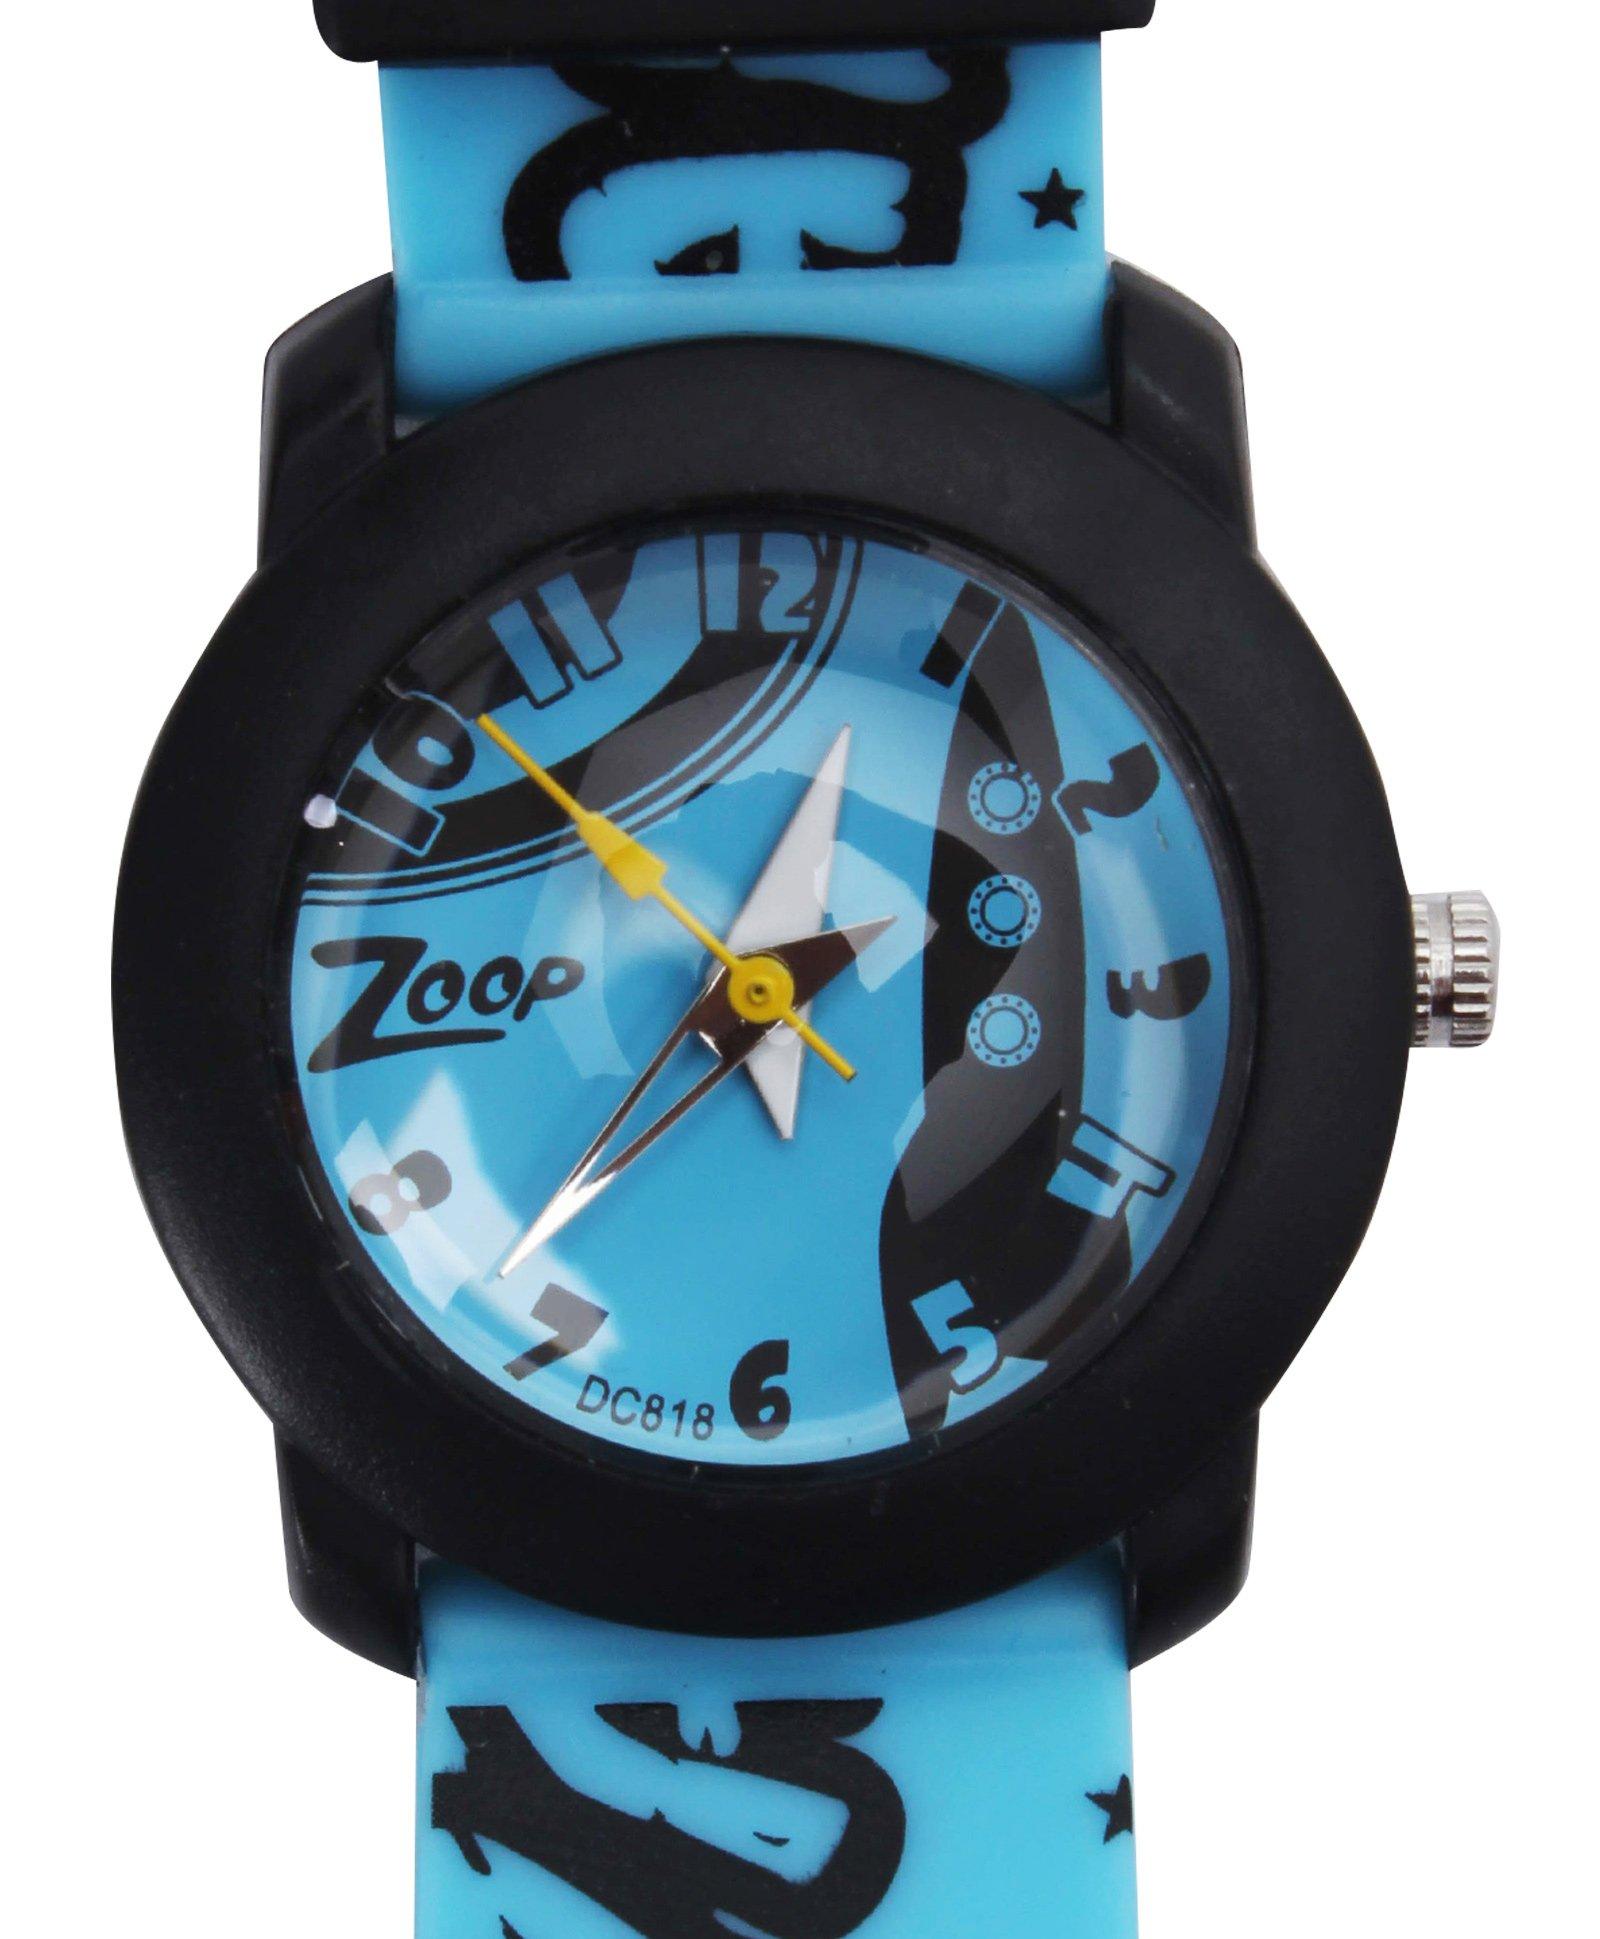 Titan brand watch2015 for girls